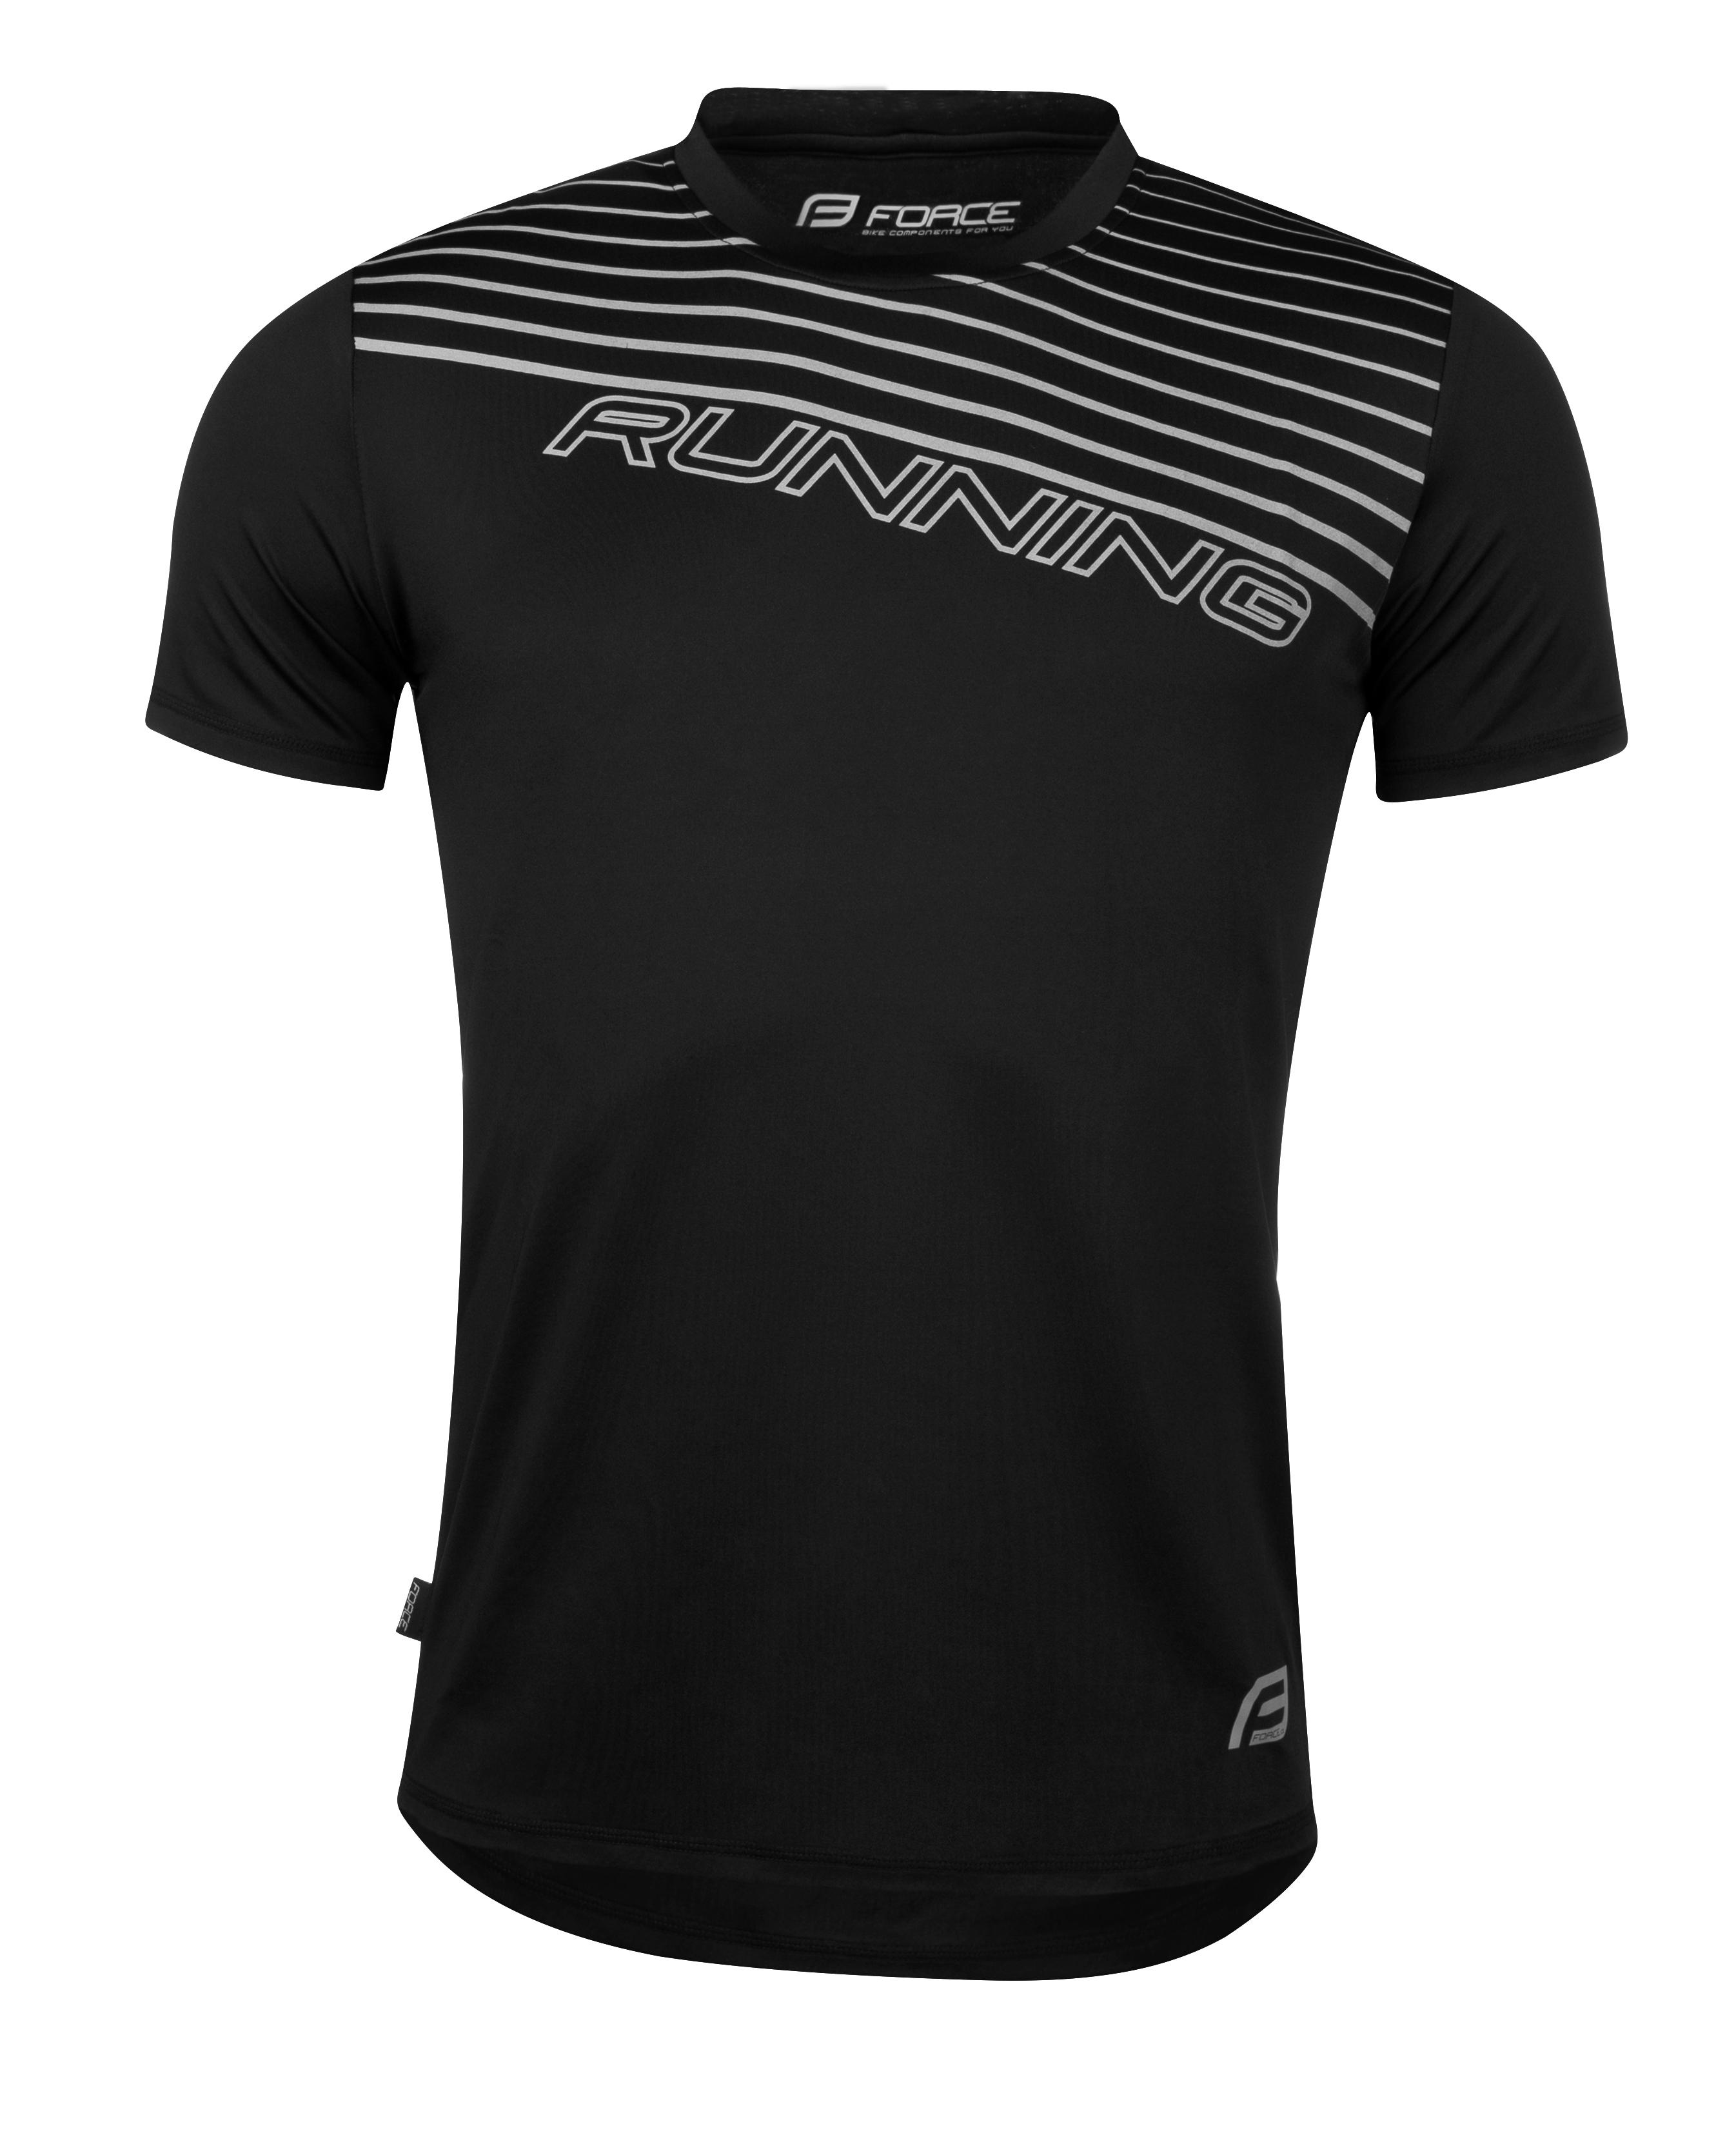 triko běžecké FORCE RUNNING, černé L